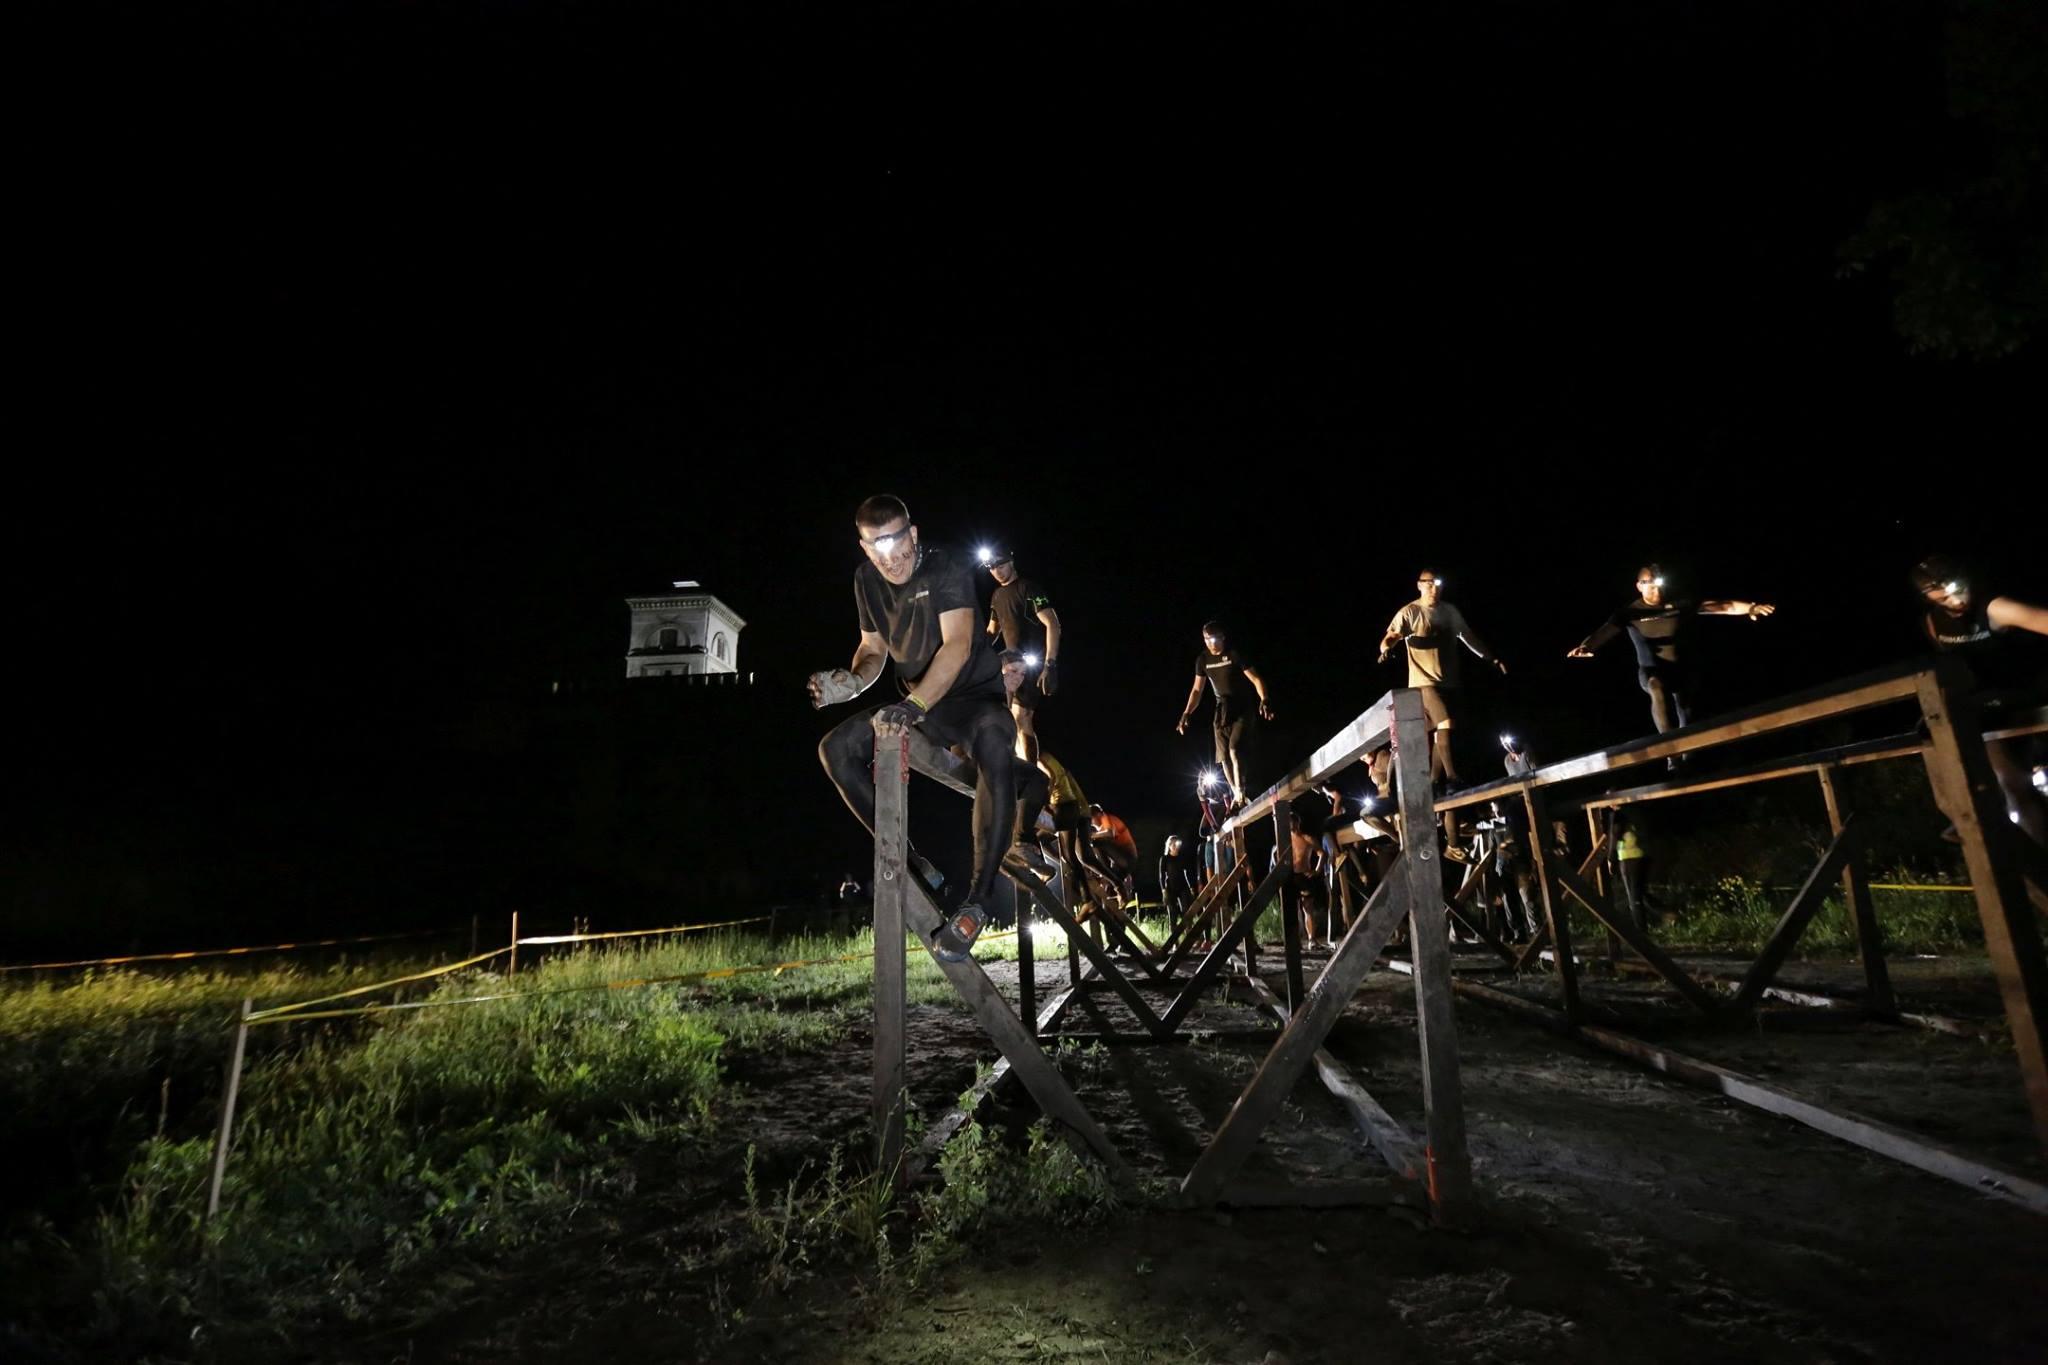 Runmageddon Rekrut Nocny Modlin 2016 zdjęcia, foto (8)